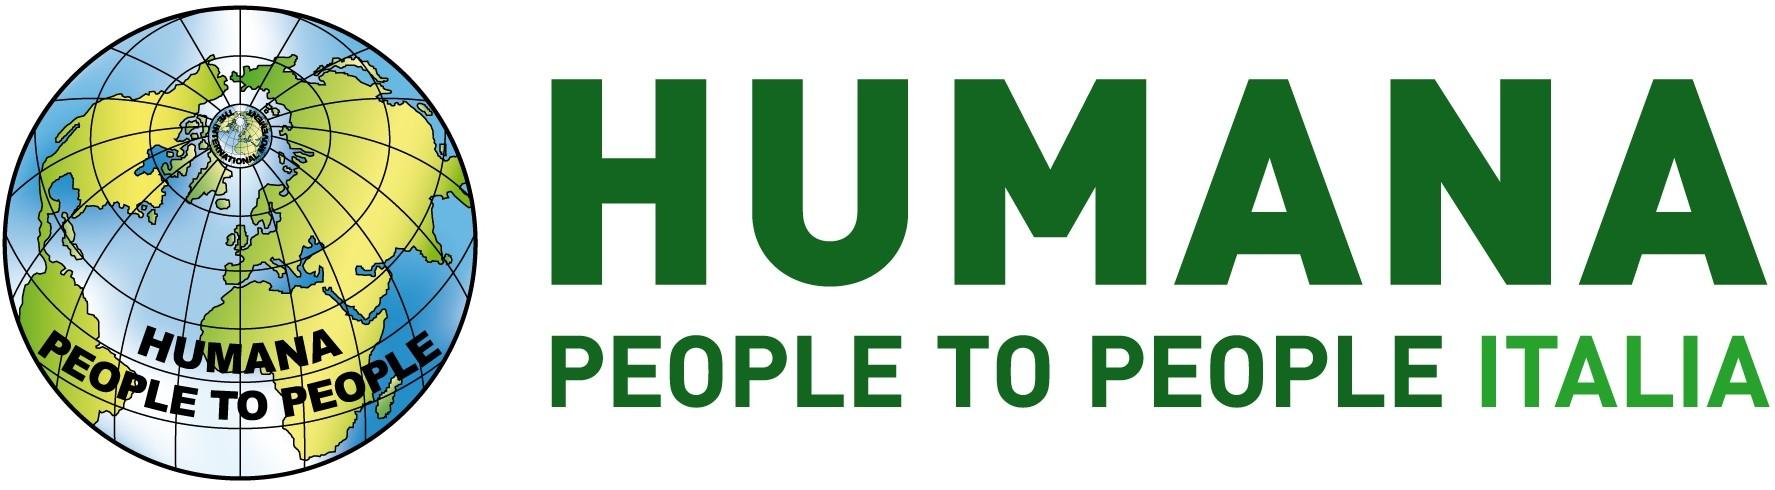 Rete del Dono - HUMANA People to People Italia